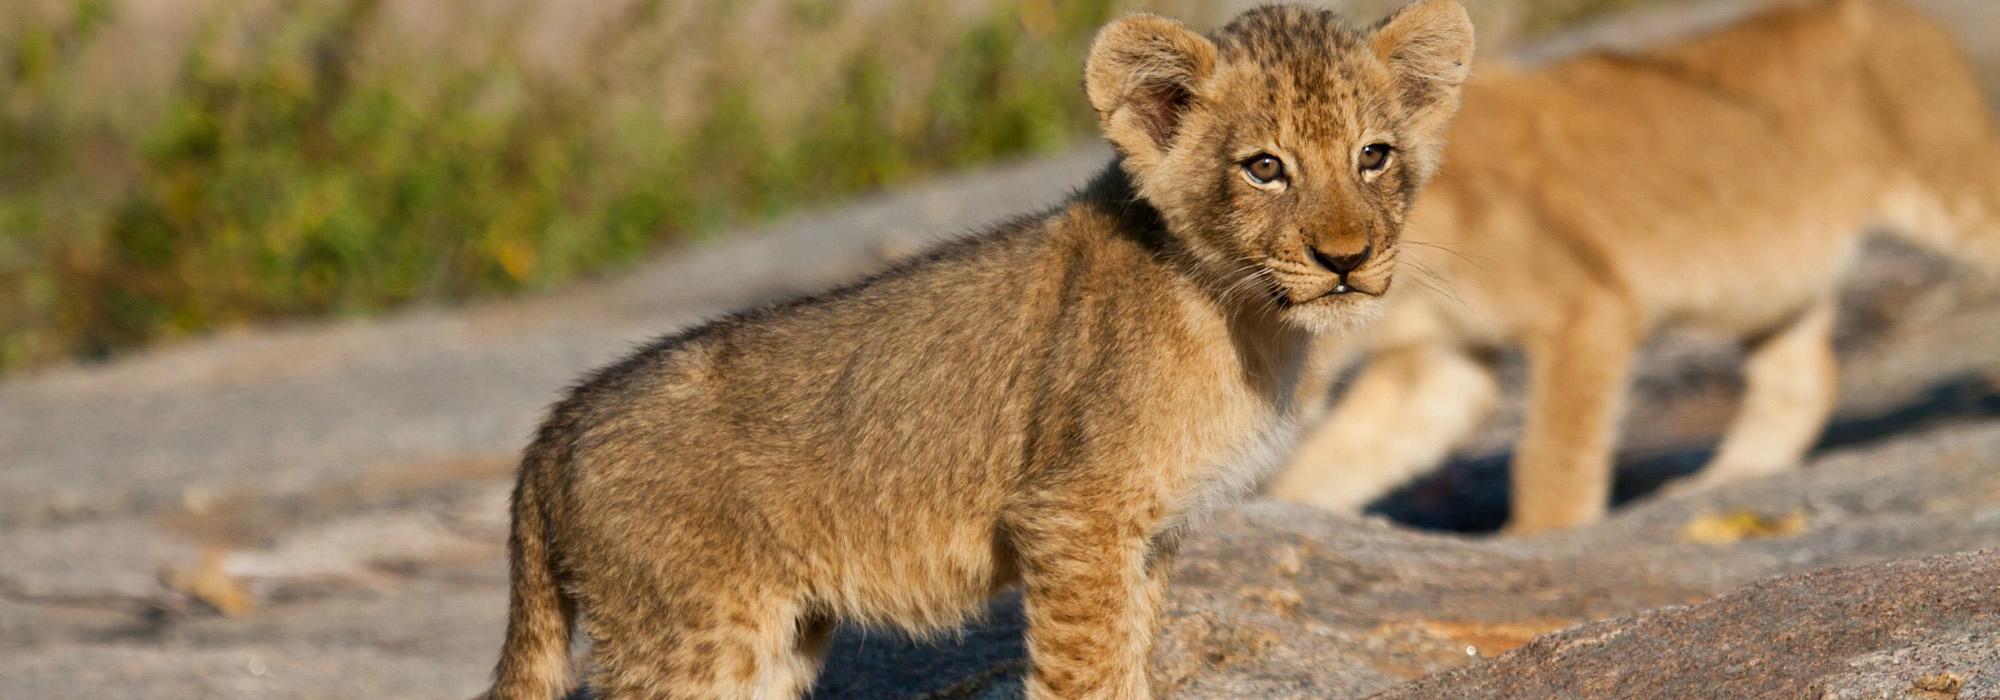 Lion cun